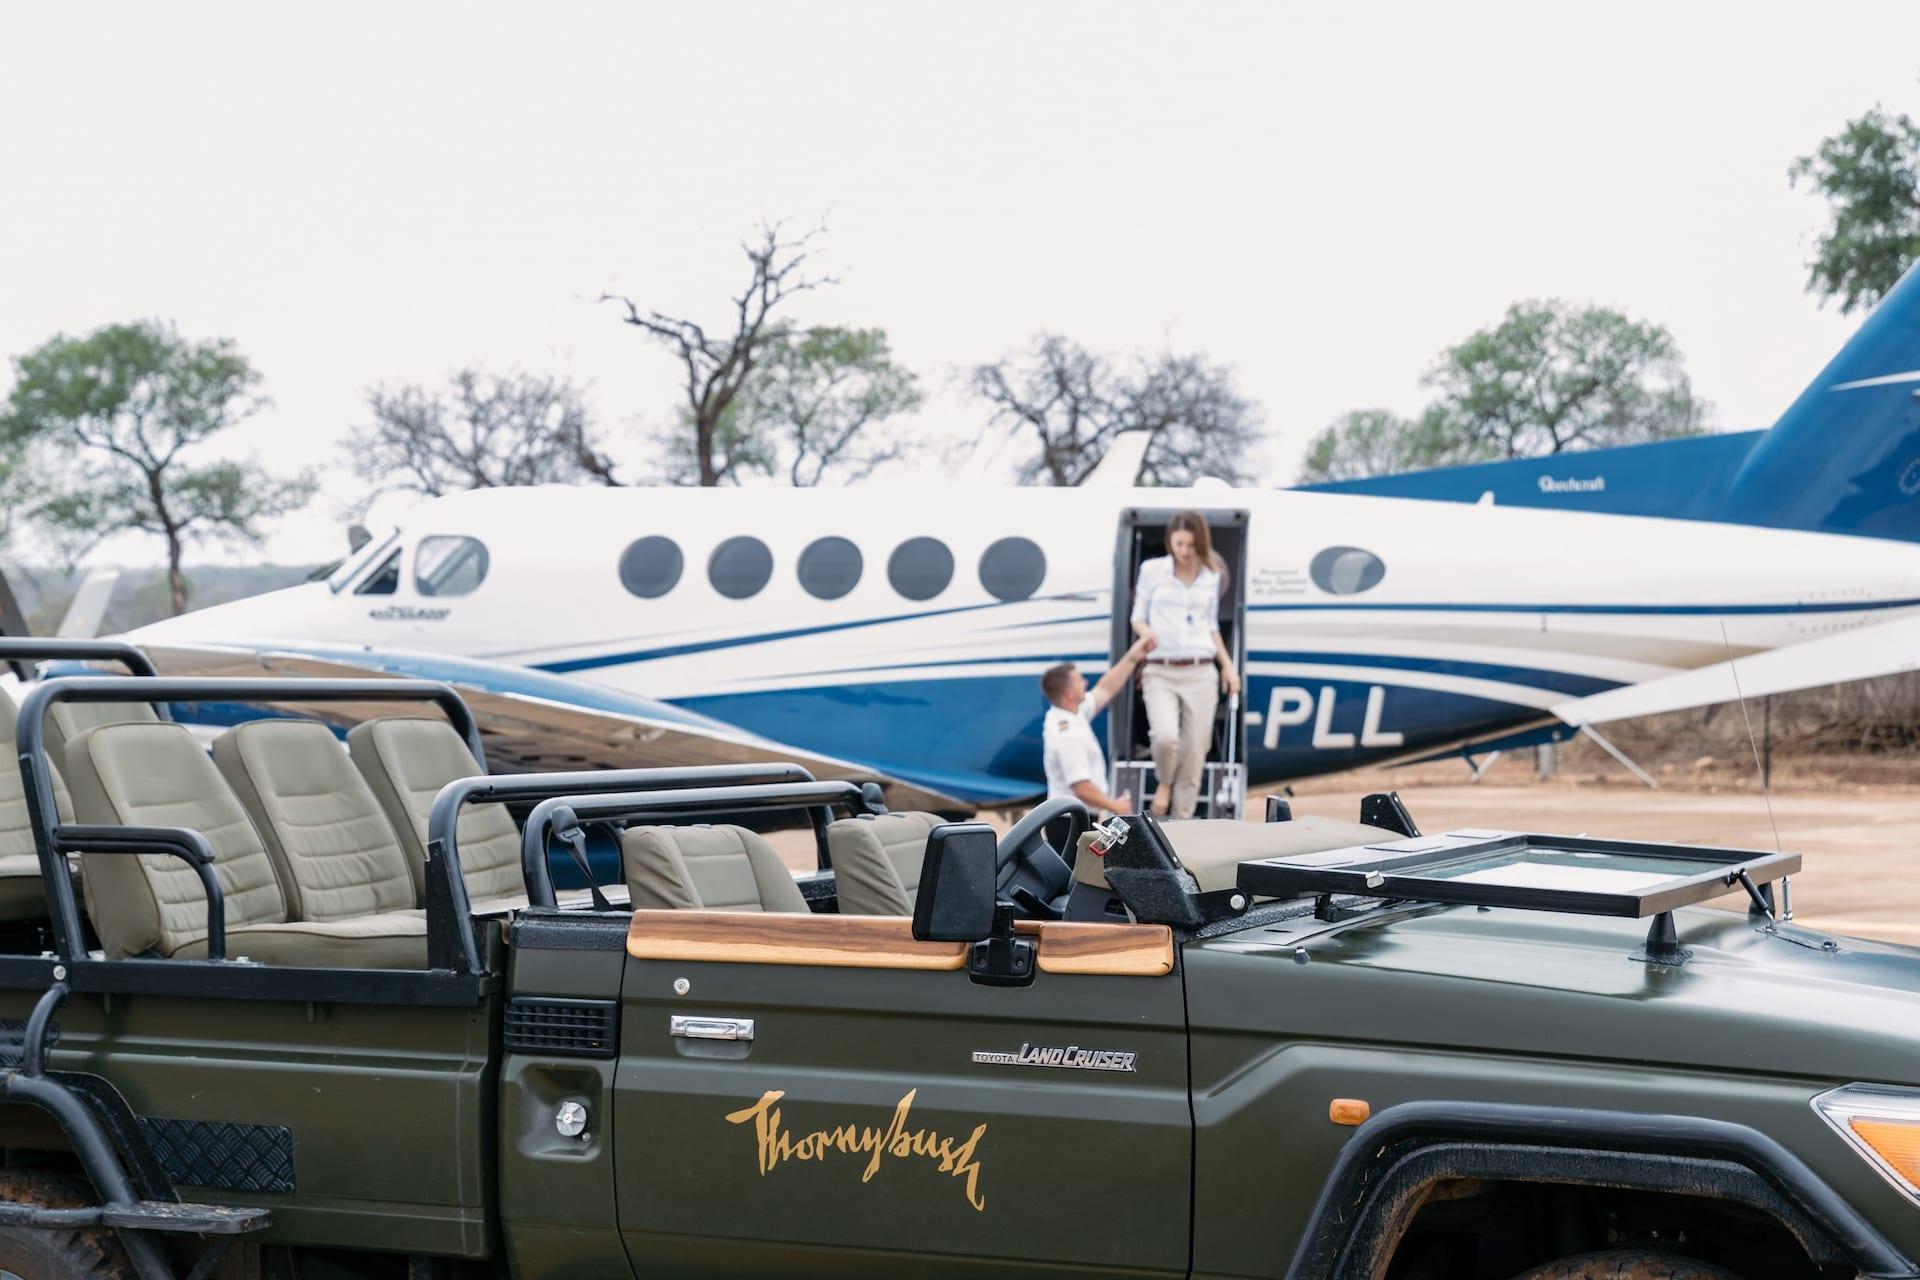 # ZA 19 - Saseka - tb_-_lifestyle_-_private_aircraft_-_fr_083